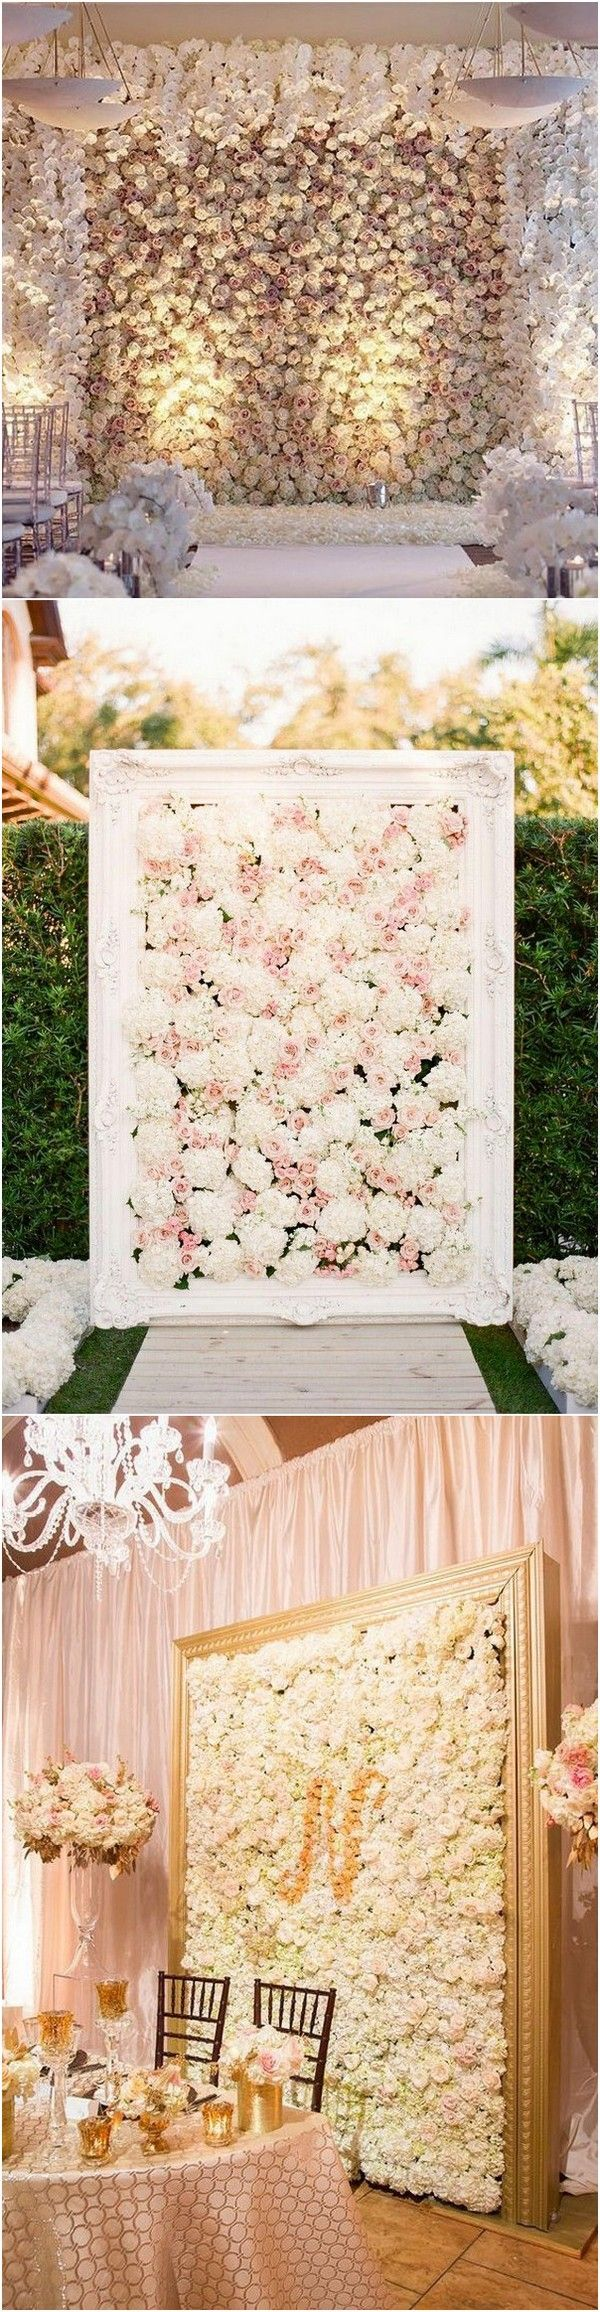 Wedding room decoration ideas 2018   Brilliant Flower Wall Wedding Backdrops for   Pelamin